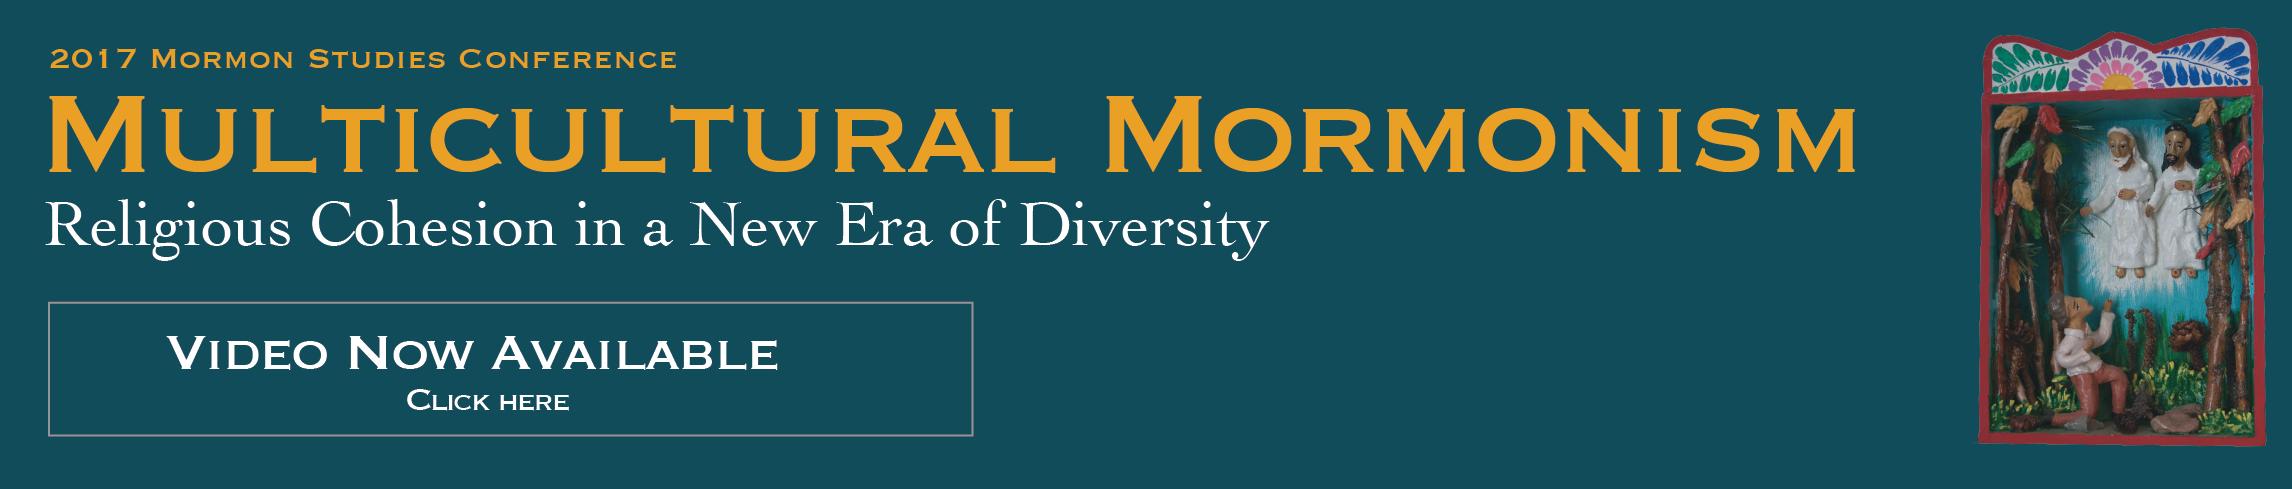 2017 Mormon Studies Conference